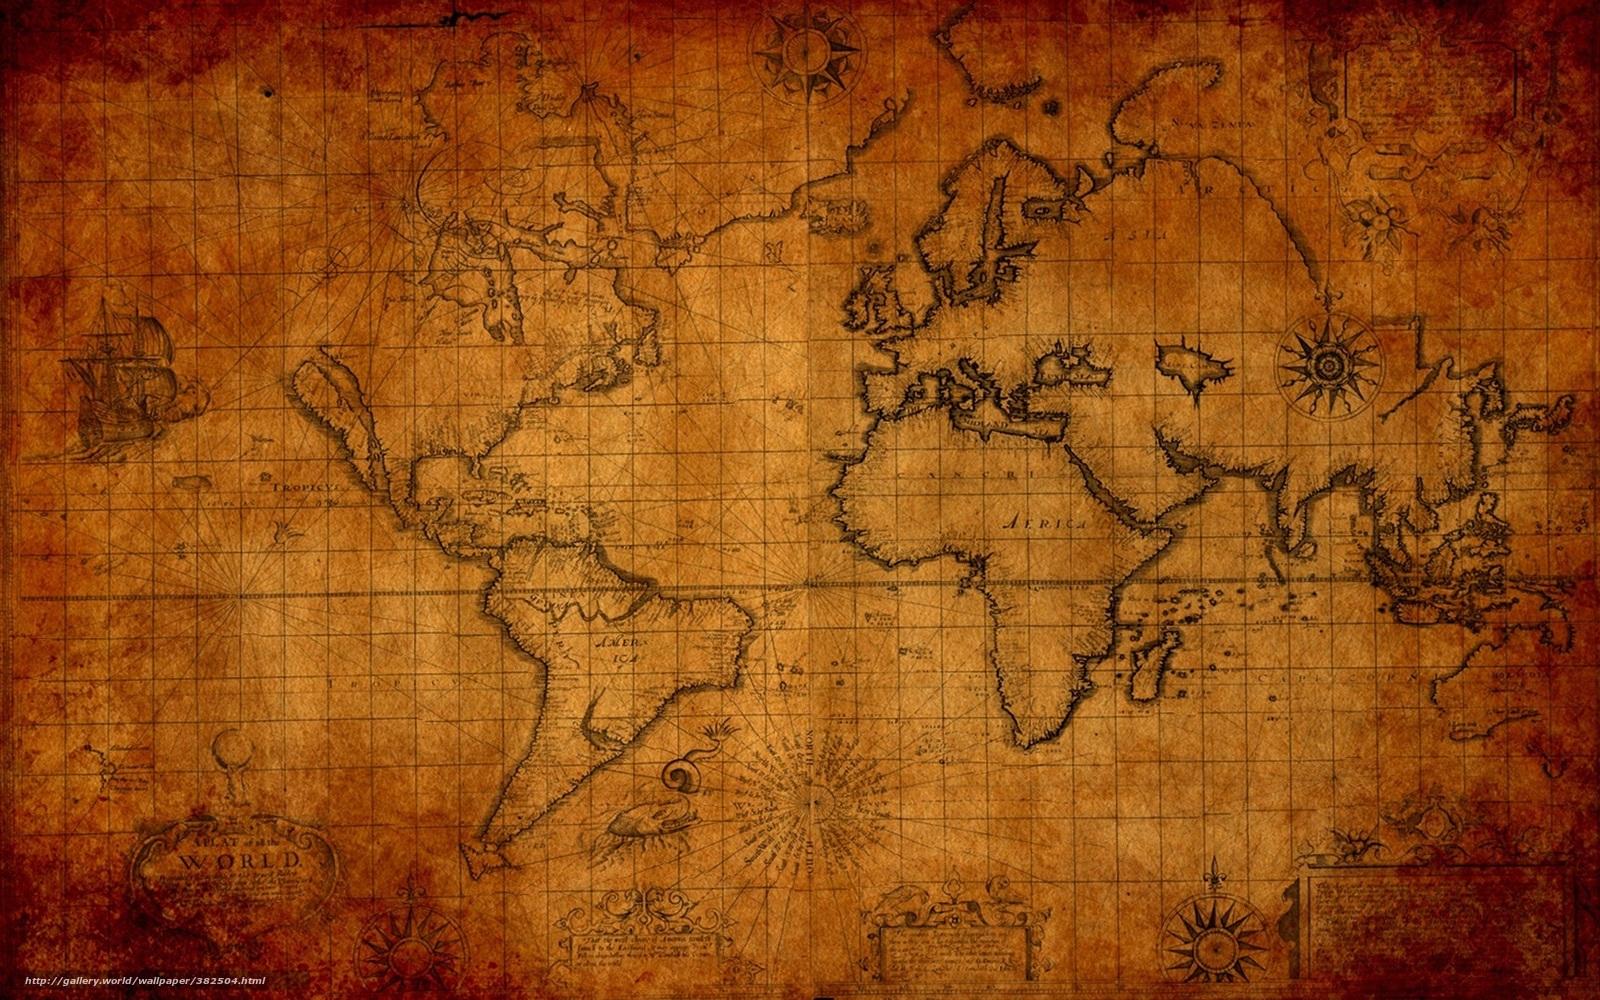 Tlcharger fond d 39 ecran vieux carte monde fonds d 39 ecran for Fond ecran monde